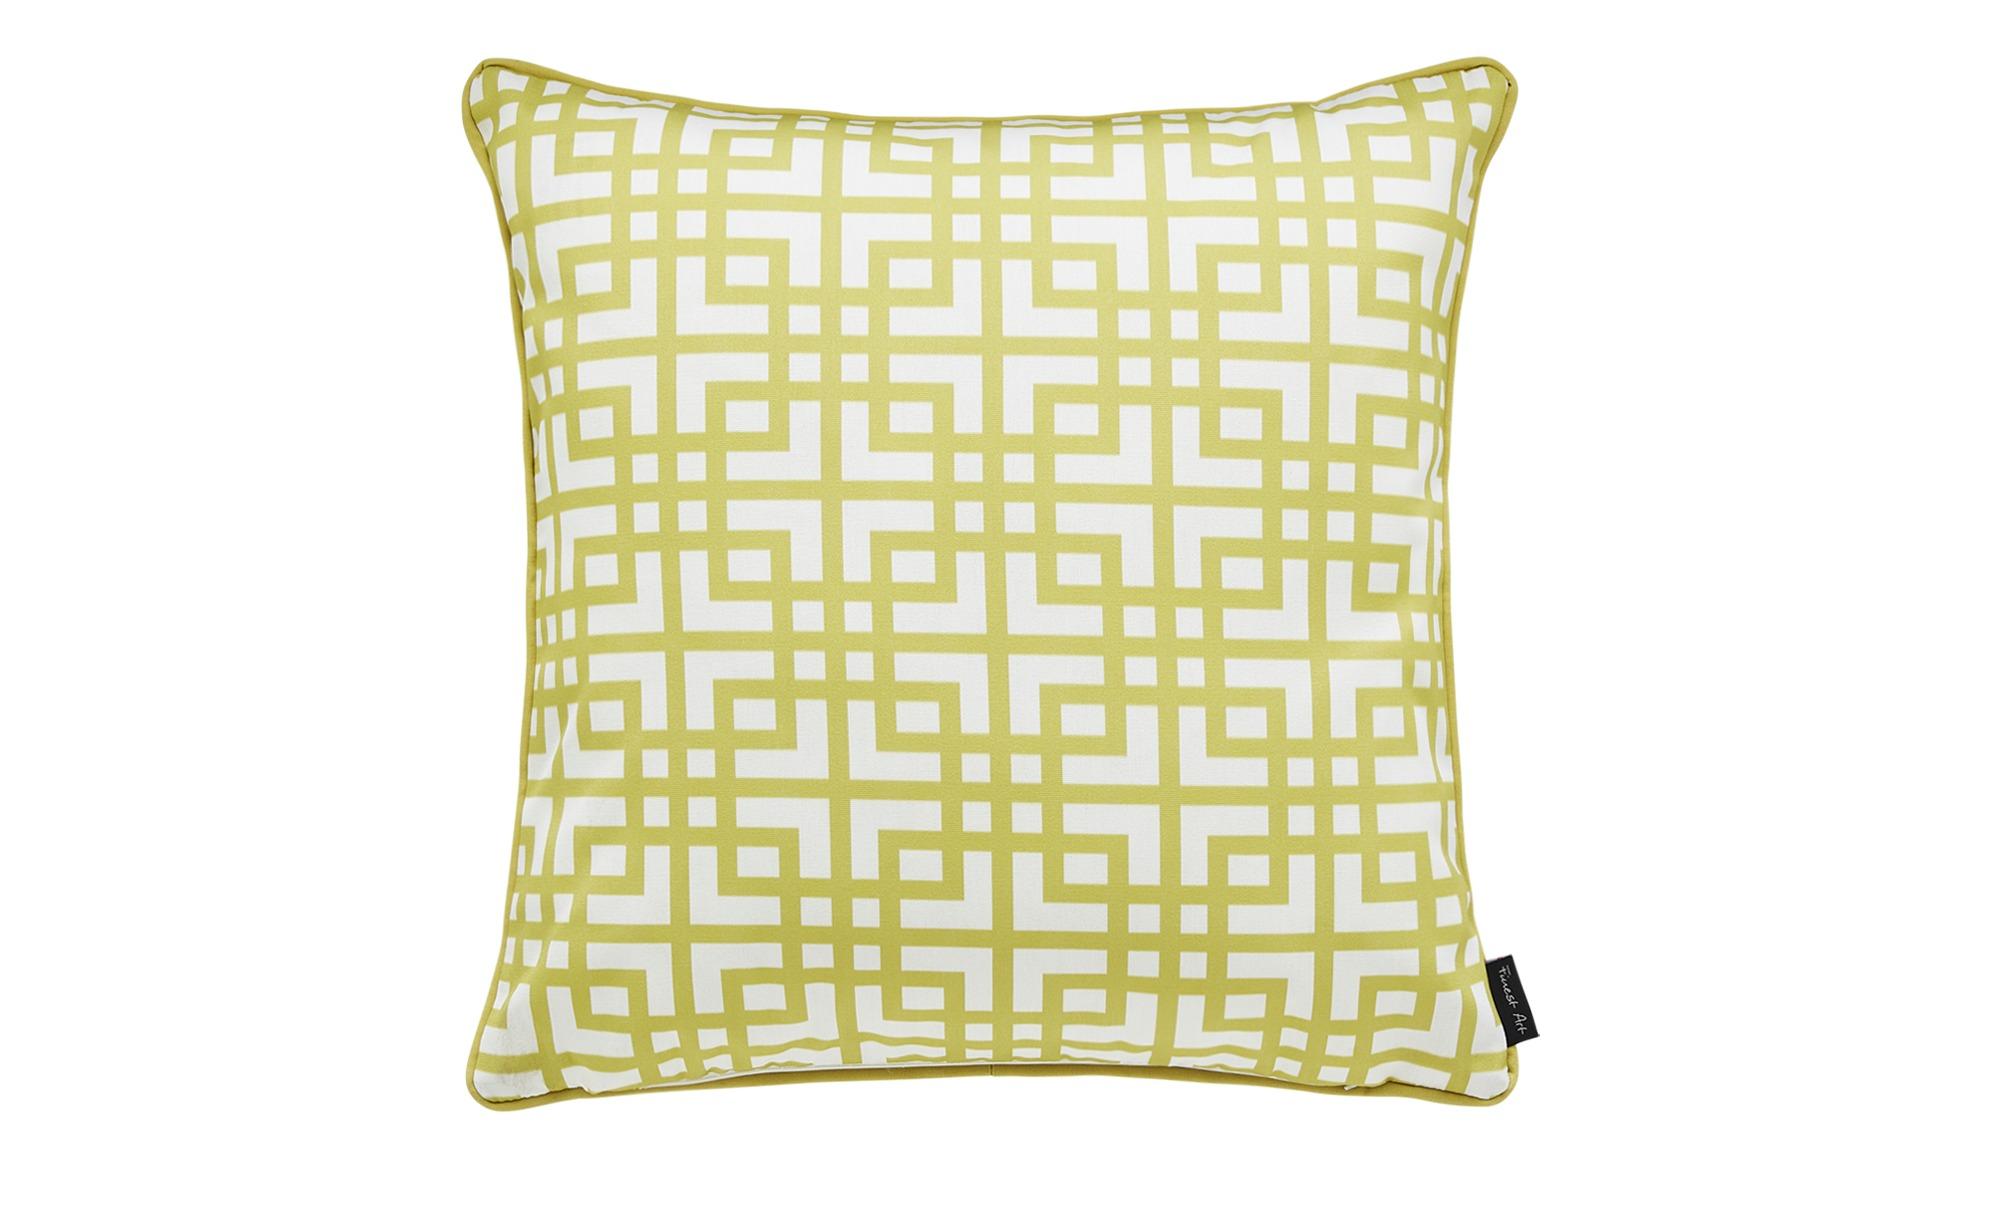 Outdoor-Kissen  Lounge ¦ gelb ¦ 100% silikonisierte Polyesterholfasern, spiralgekräuselt ¦ Maße (cm): B: 48 Heimtextilien > Kissen > Dekokissen - Höffner